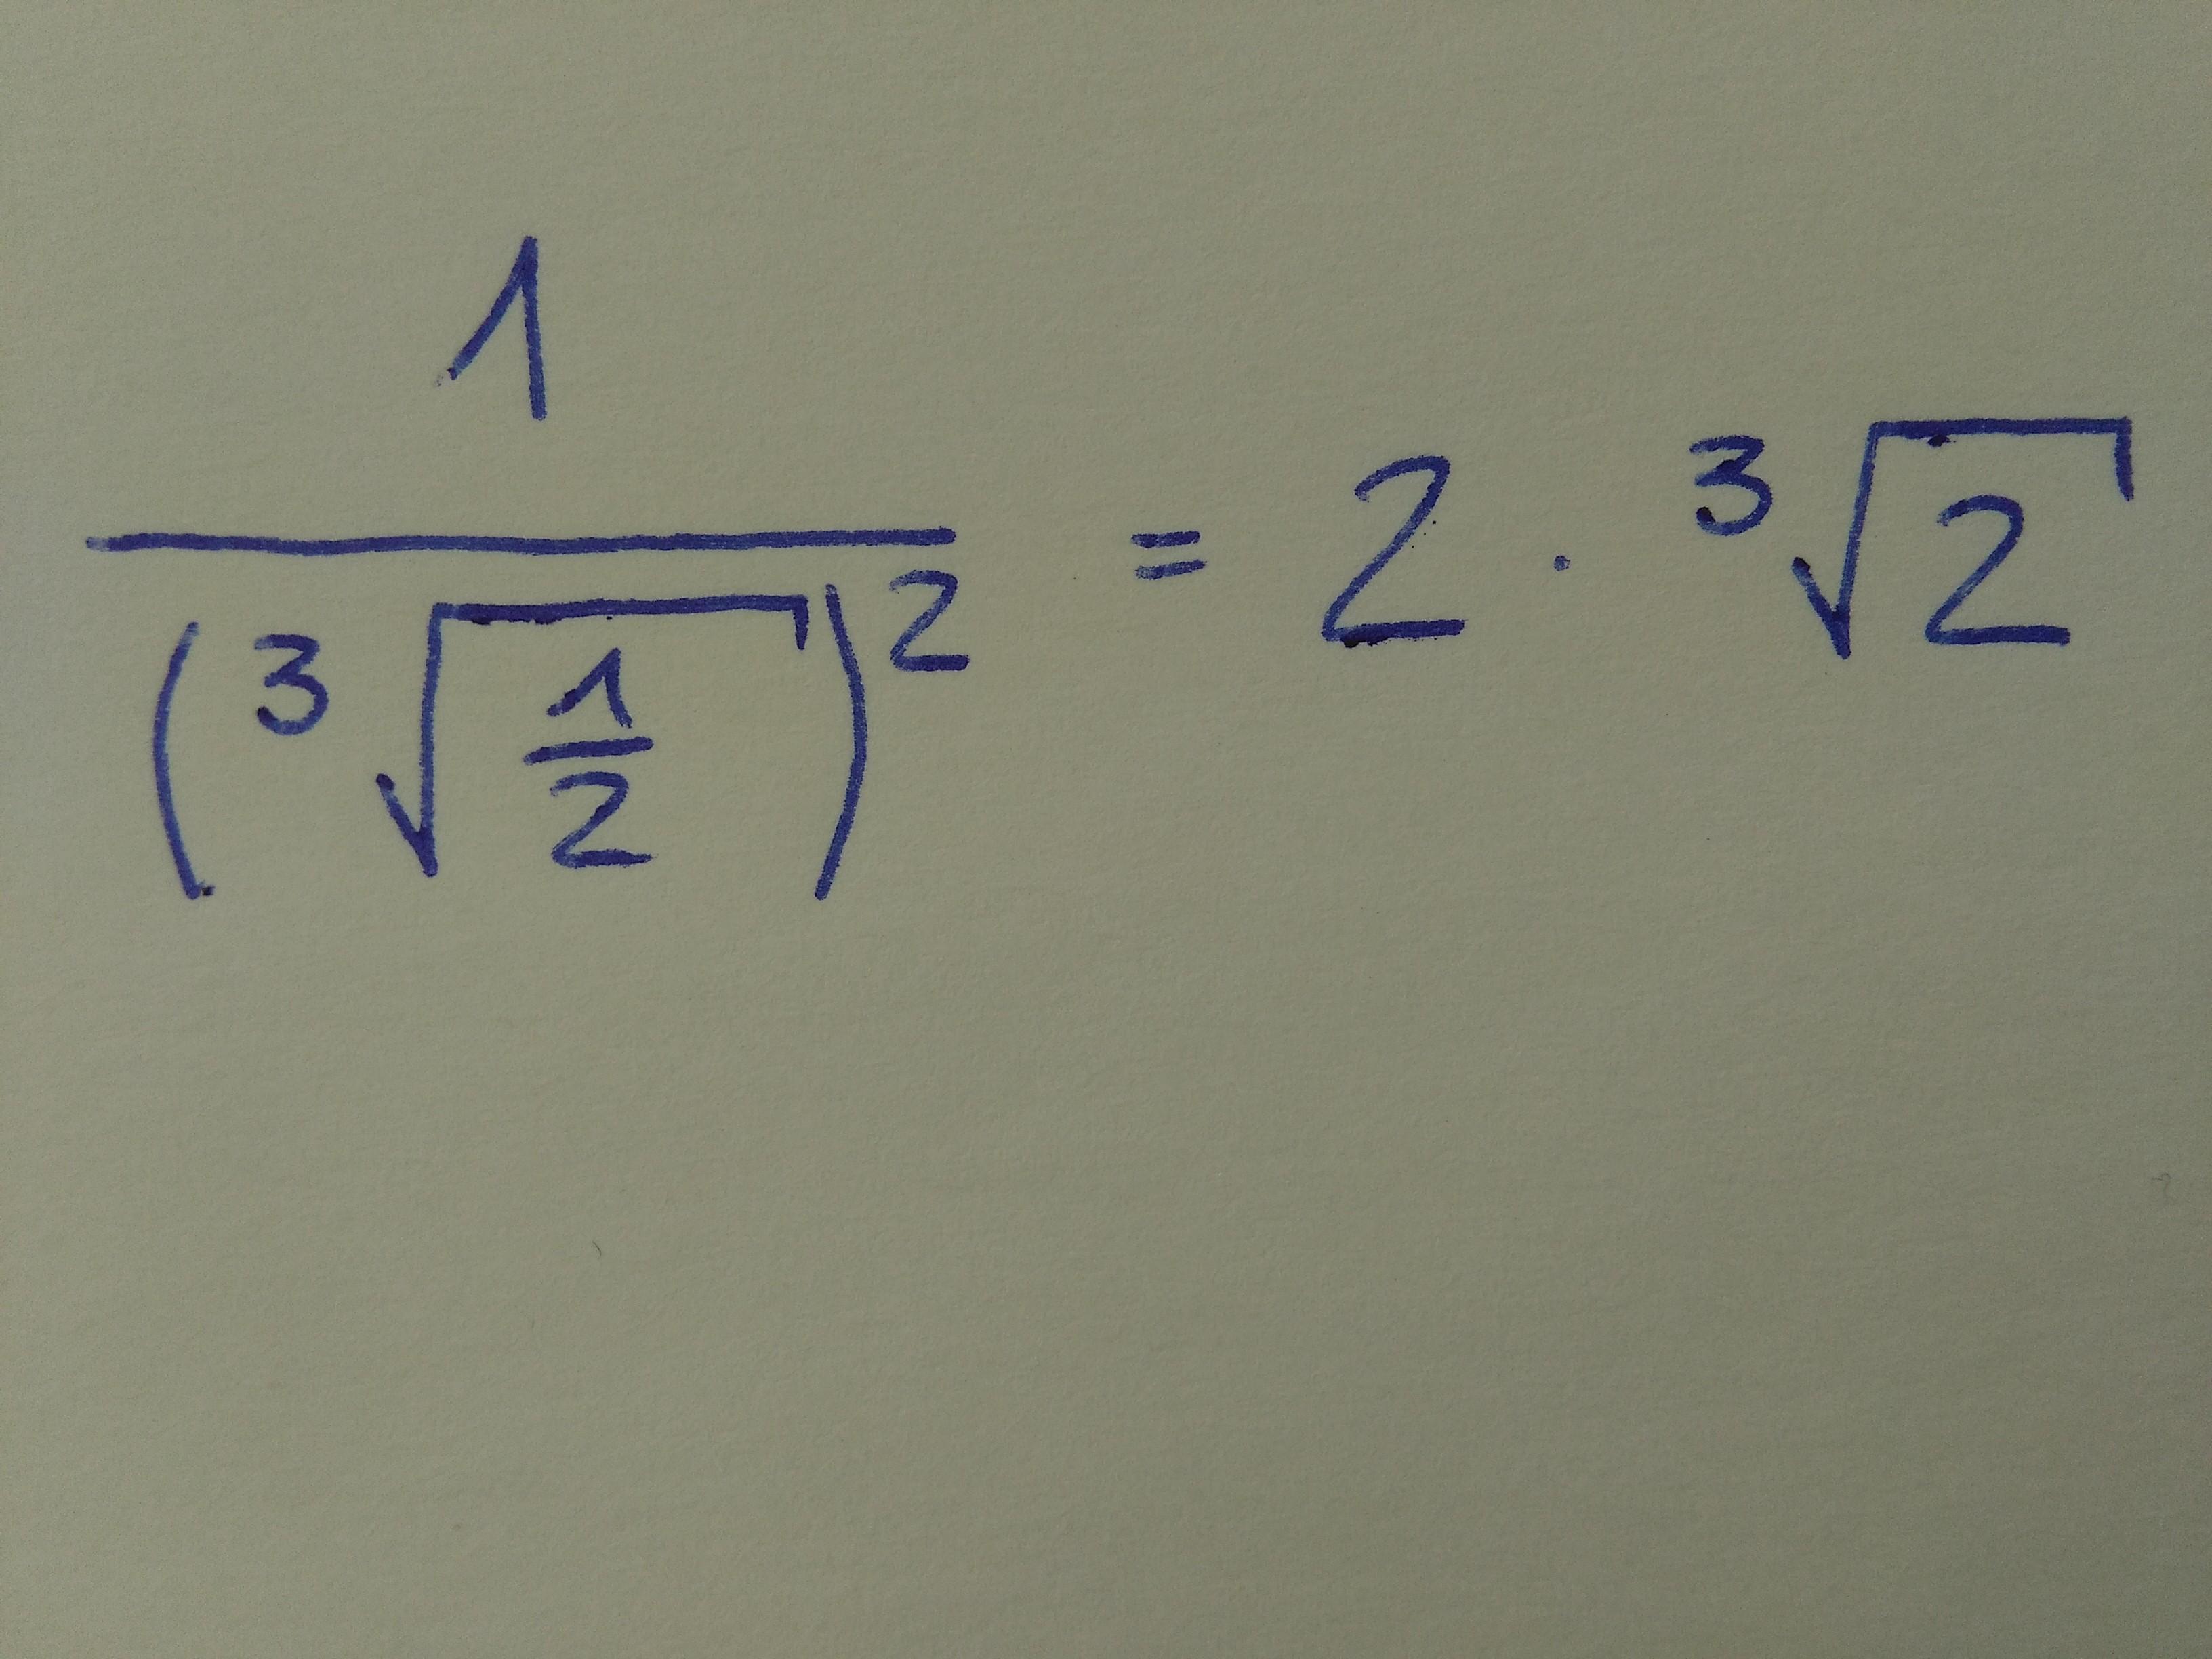 wurzel vereinfachen (mathe)? (mathematik, bruch)